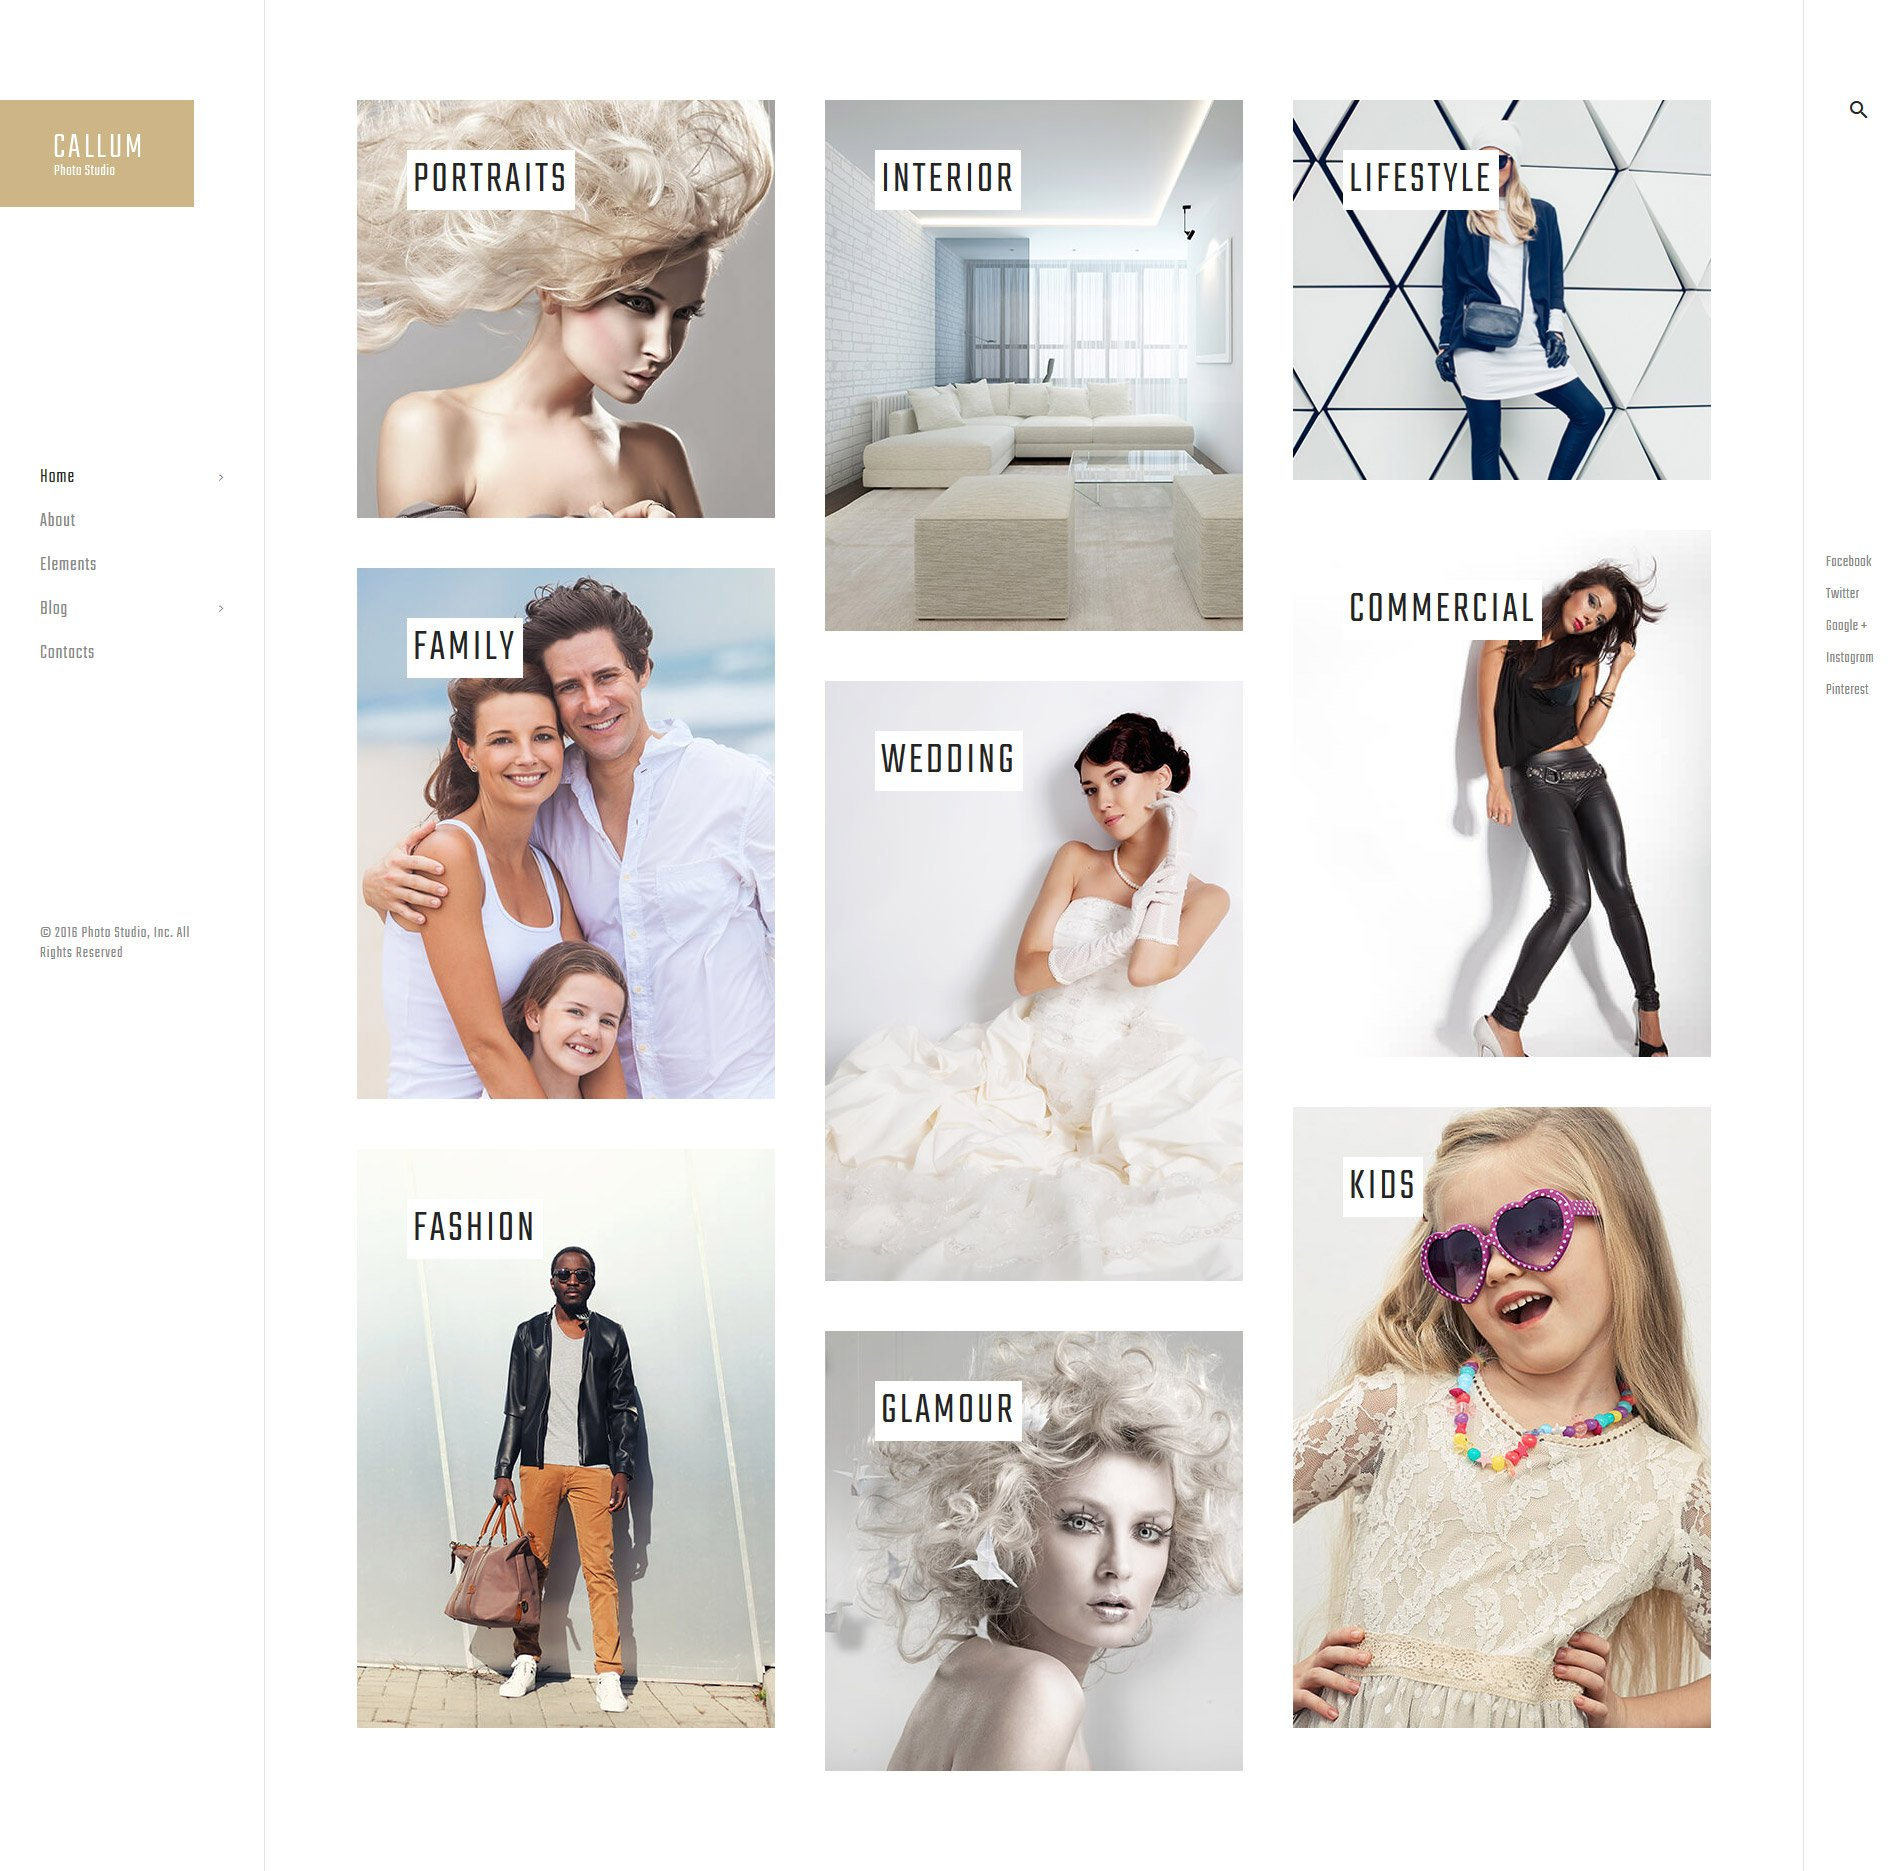 """Callum - wedding photo gallery"" - адаптивний WordPress шаблон №61164 - скріншот"